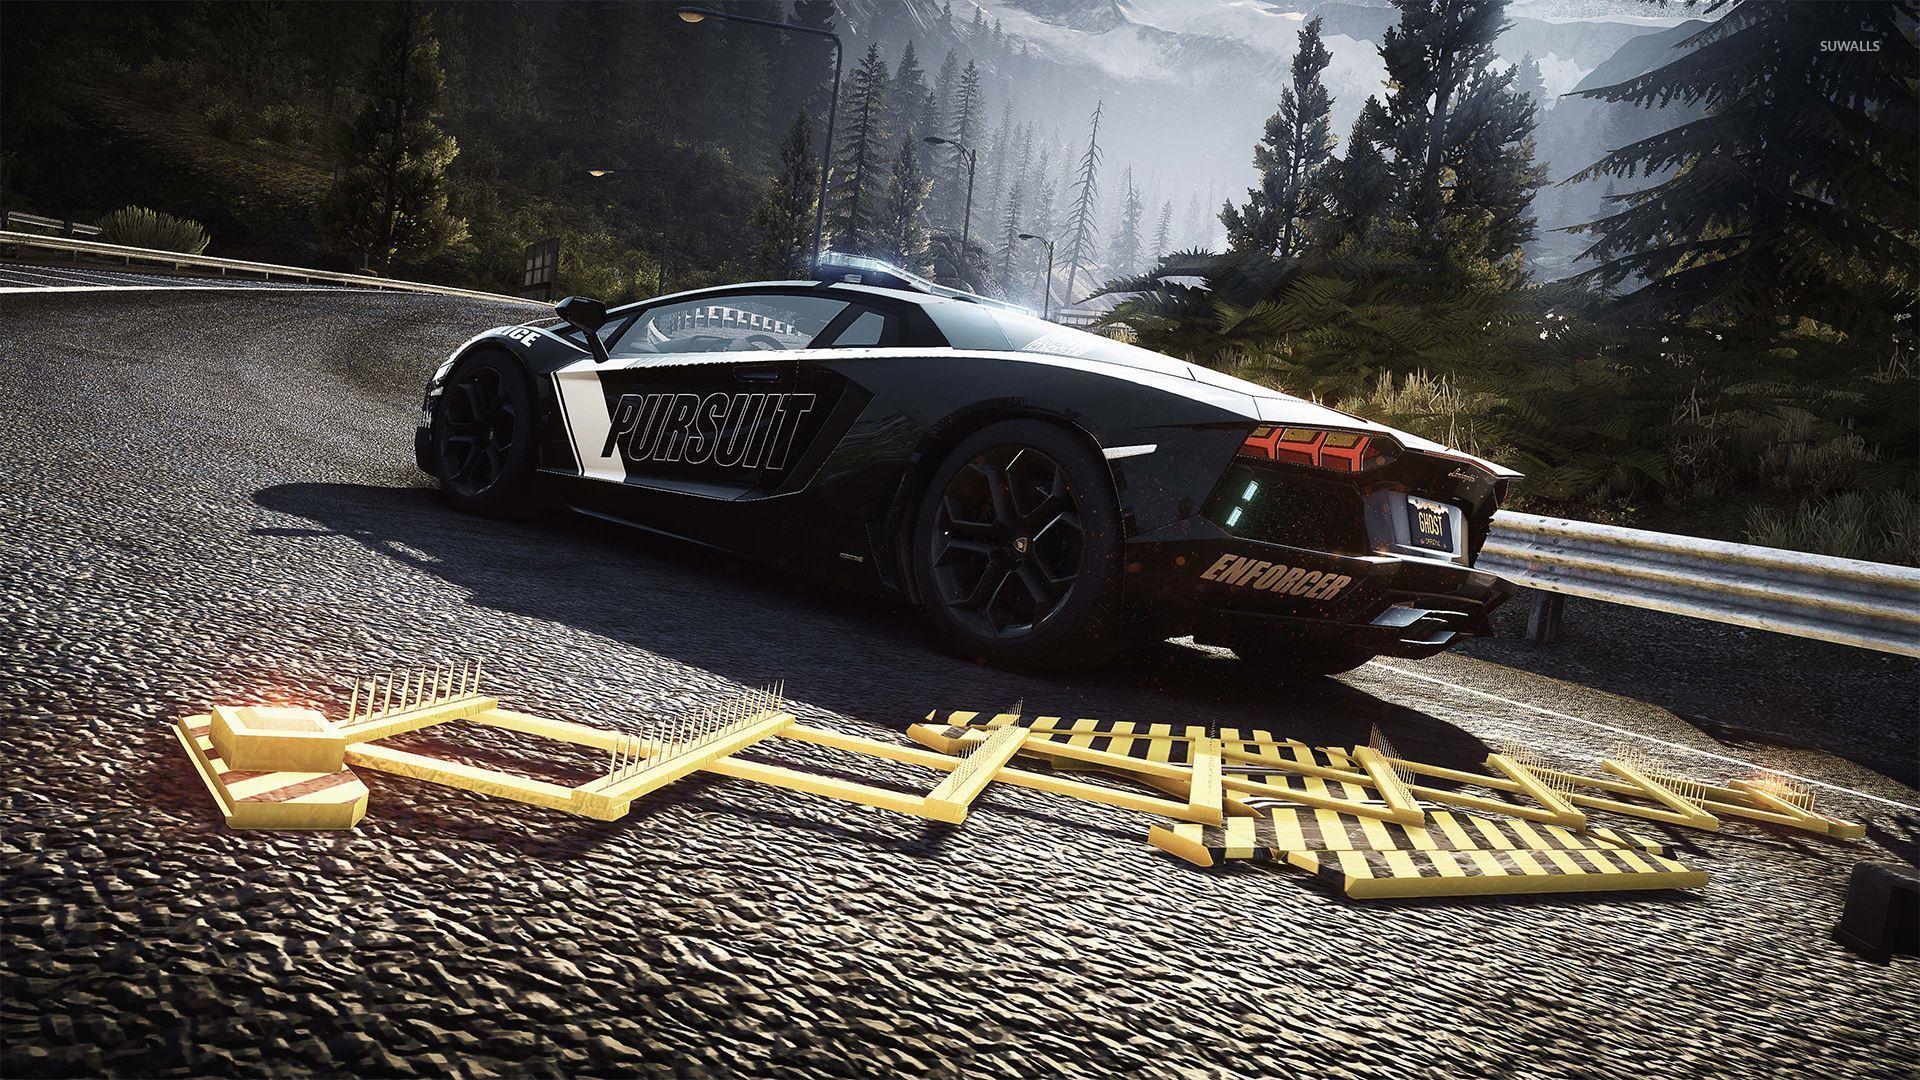 lamborghini-aventador-need-for-speed-rivals-34779-1920x1080 Extraordinary Lamborghini Huracan Need for Speed Cars Trend